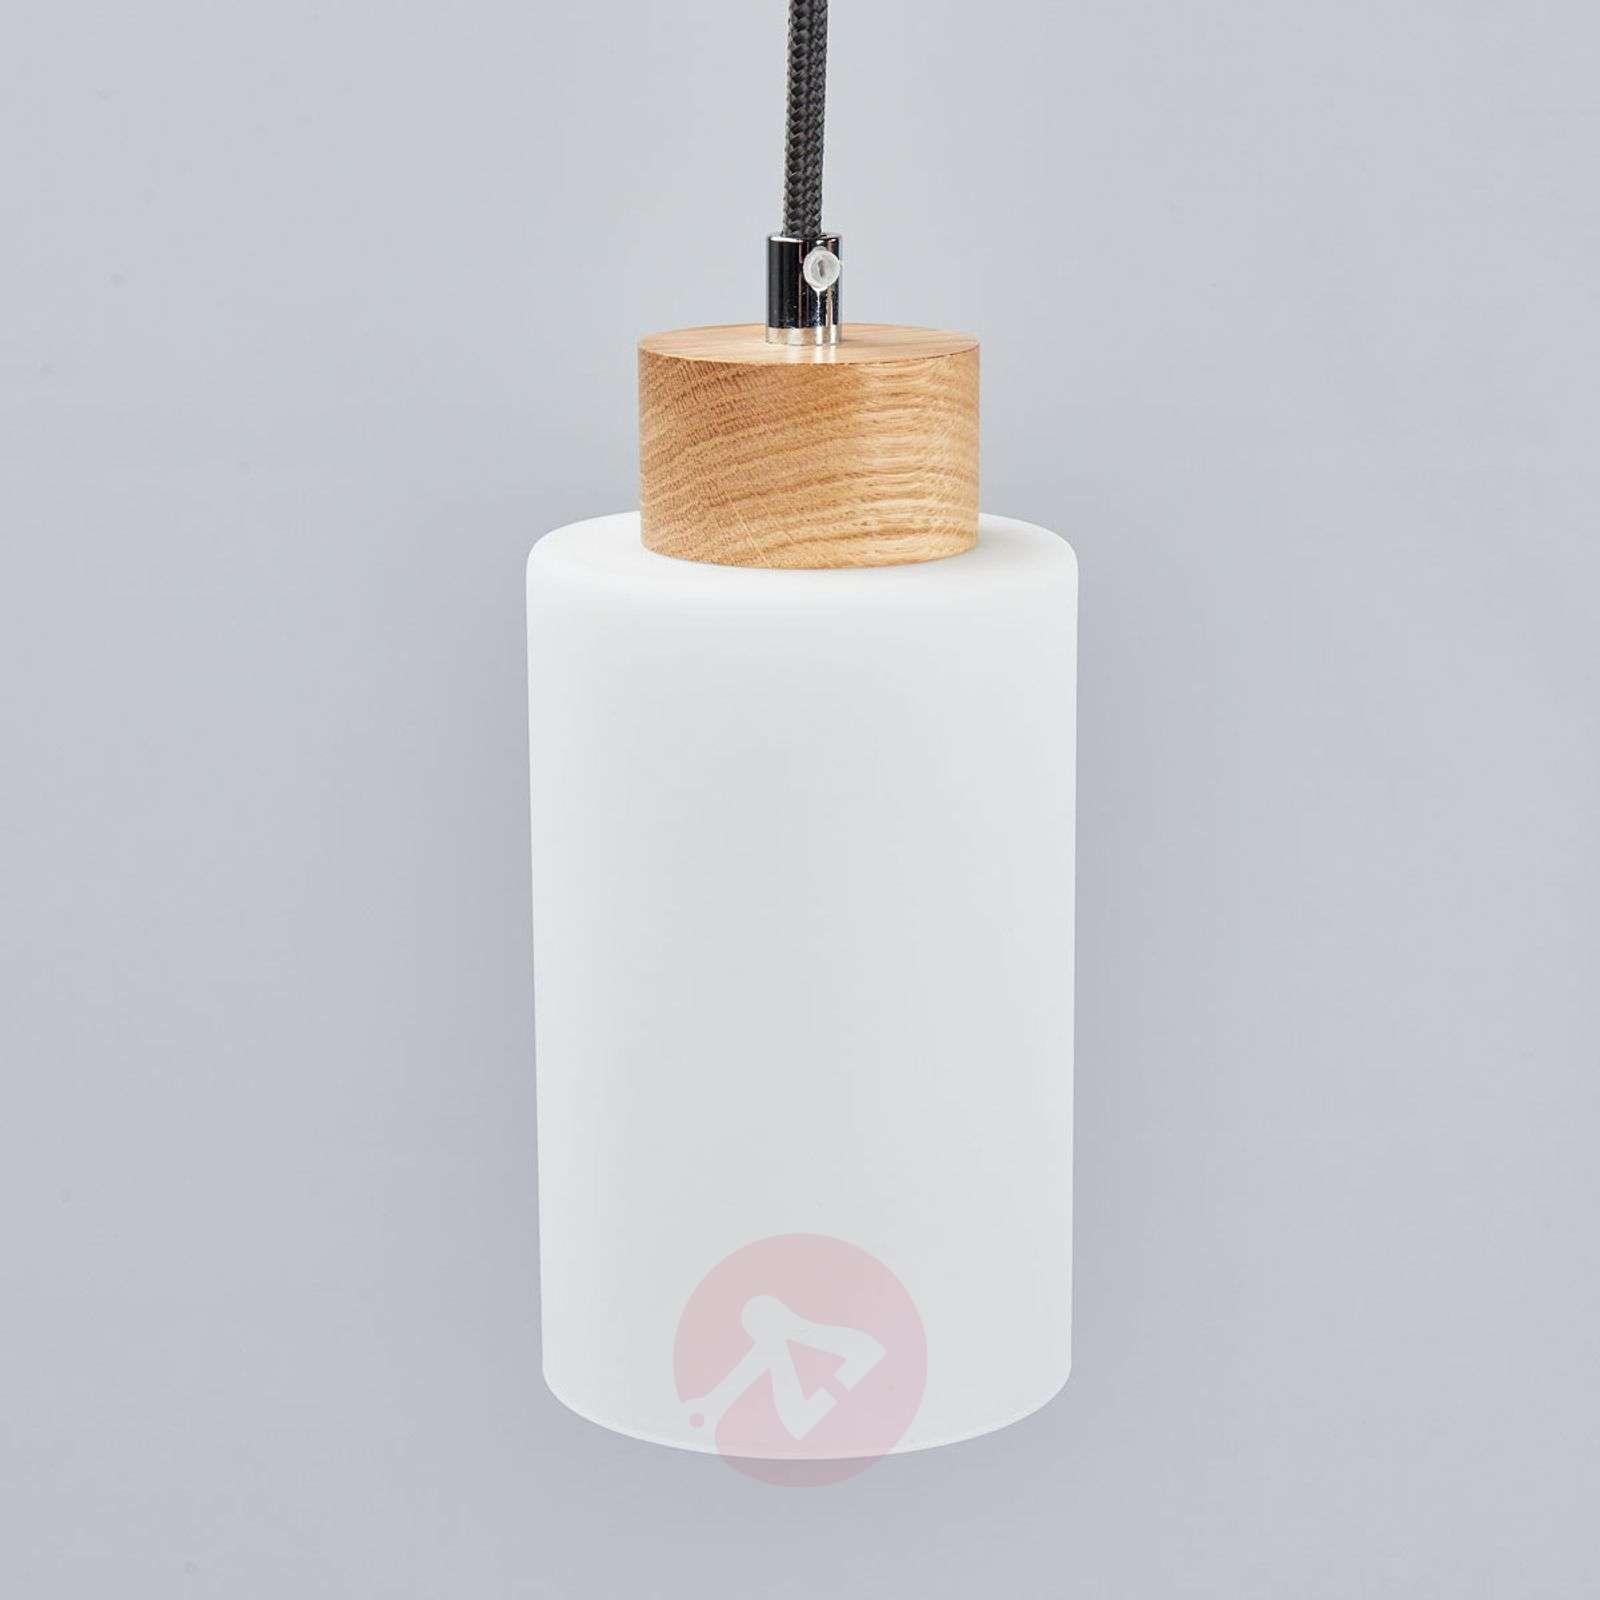 Bosco linear pendant light, oiled oak, 3-bulb-8574280-01